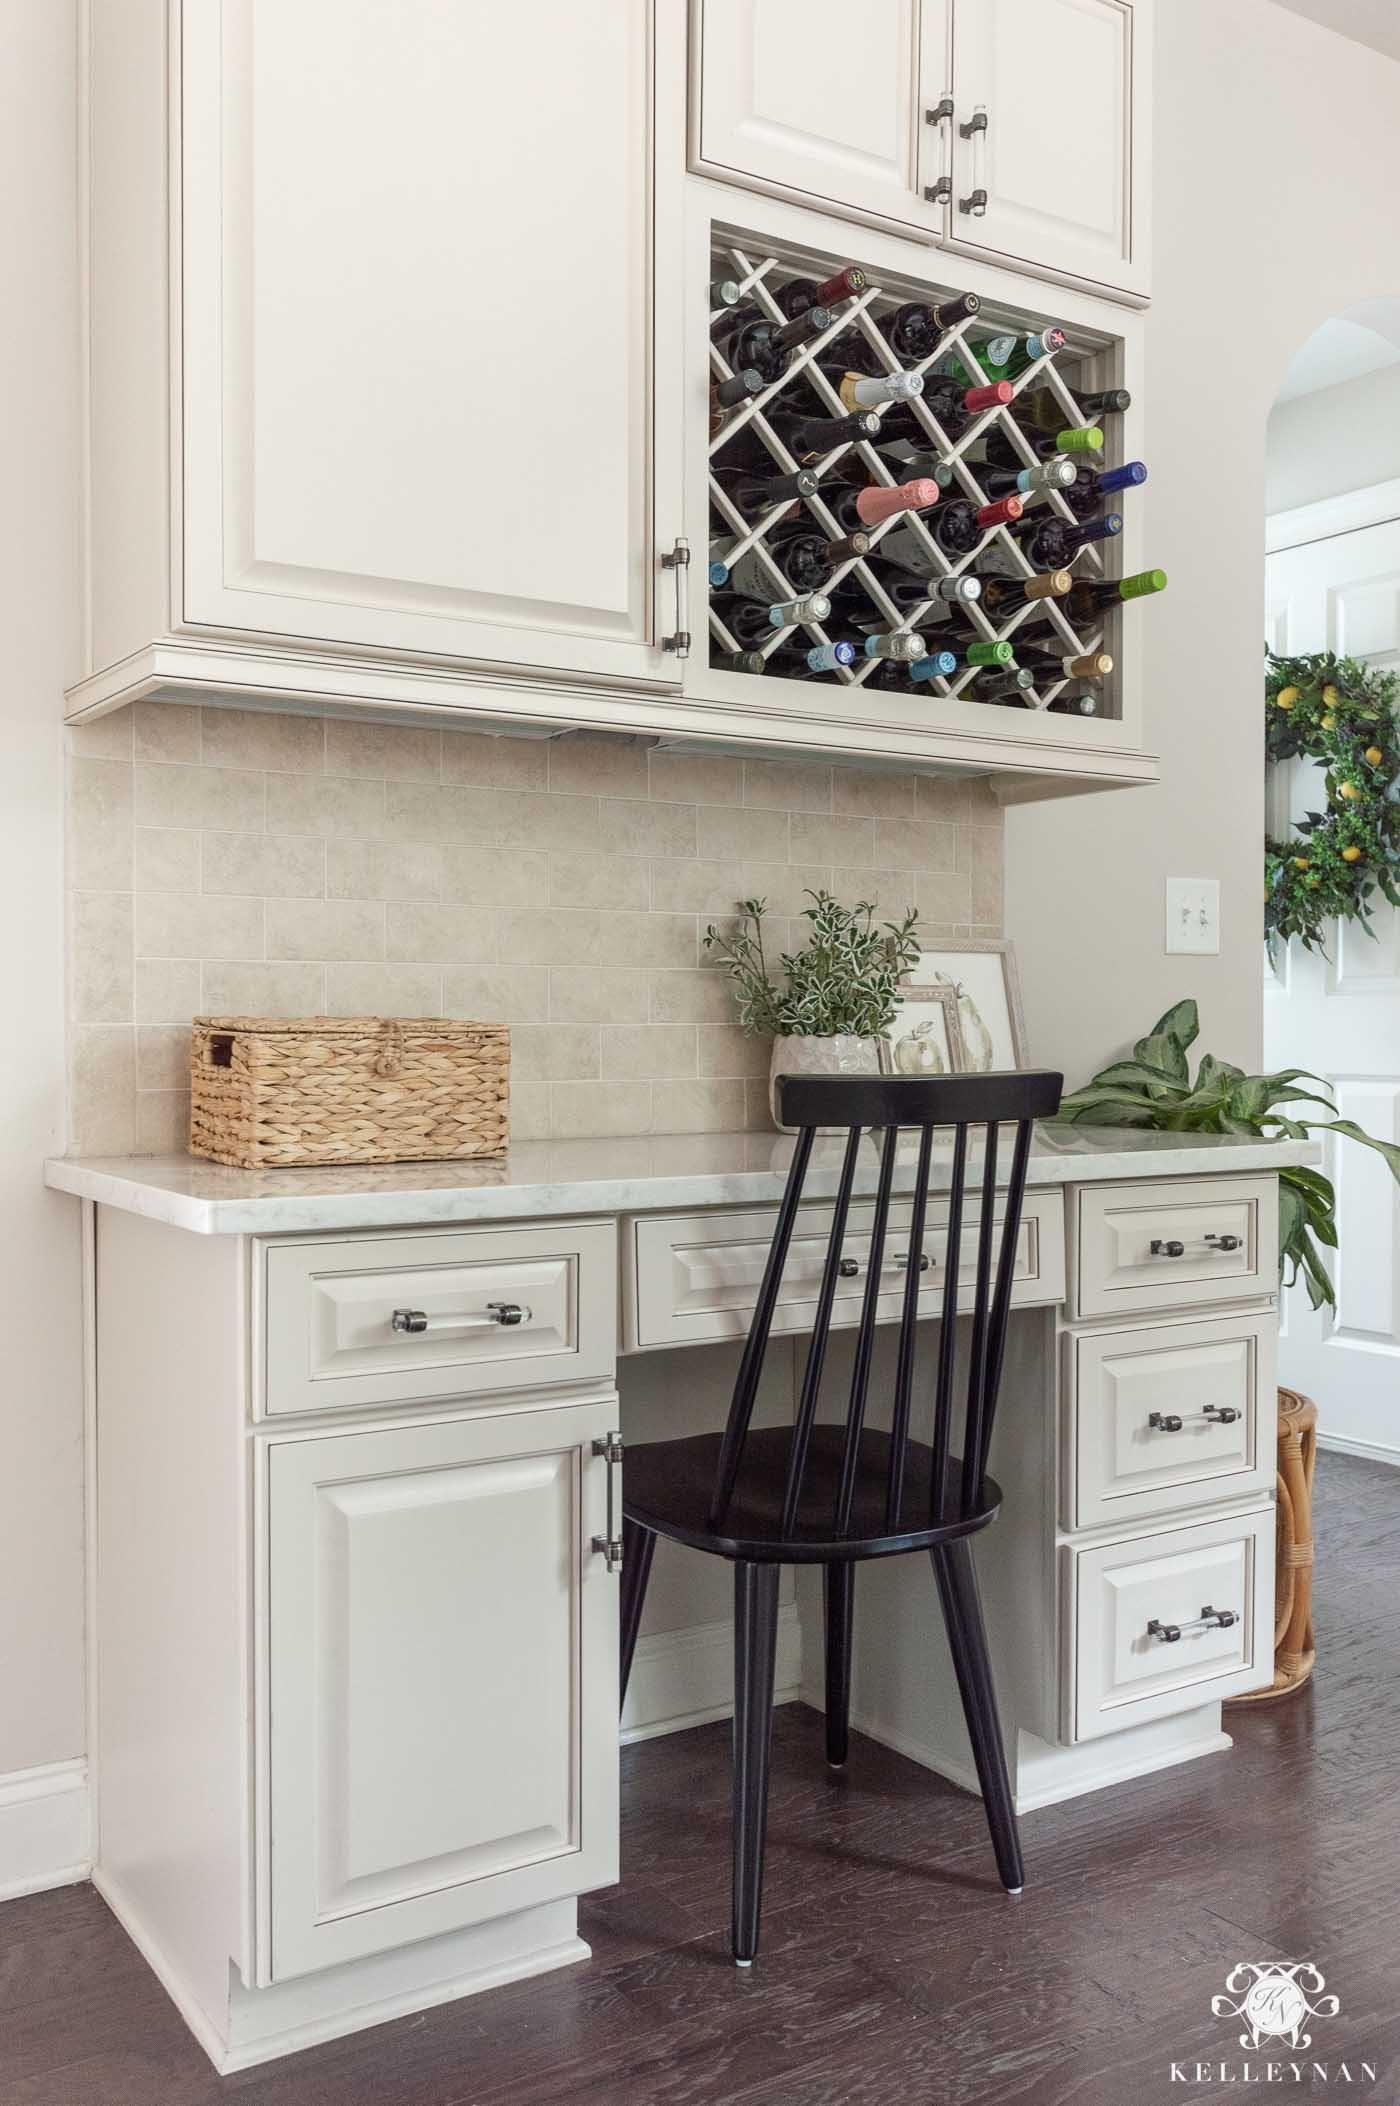 Kitchen Desk Area Inspiration with Wine Lattice